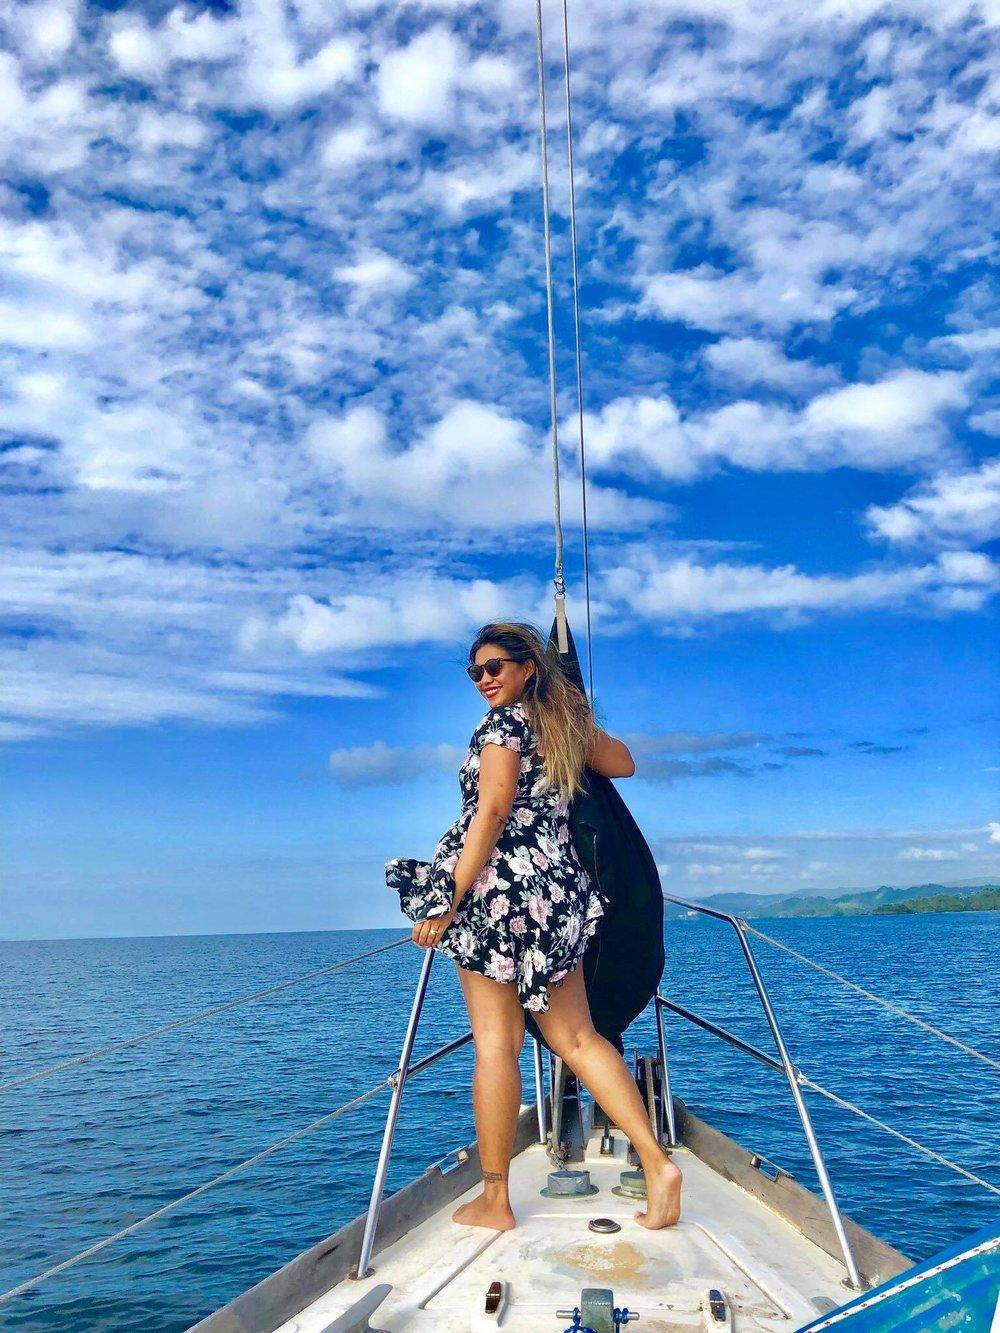 Sailing Life Day 291 Good morning sunshine!! 😍8.jpg